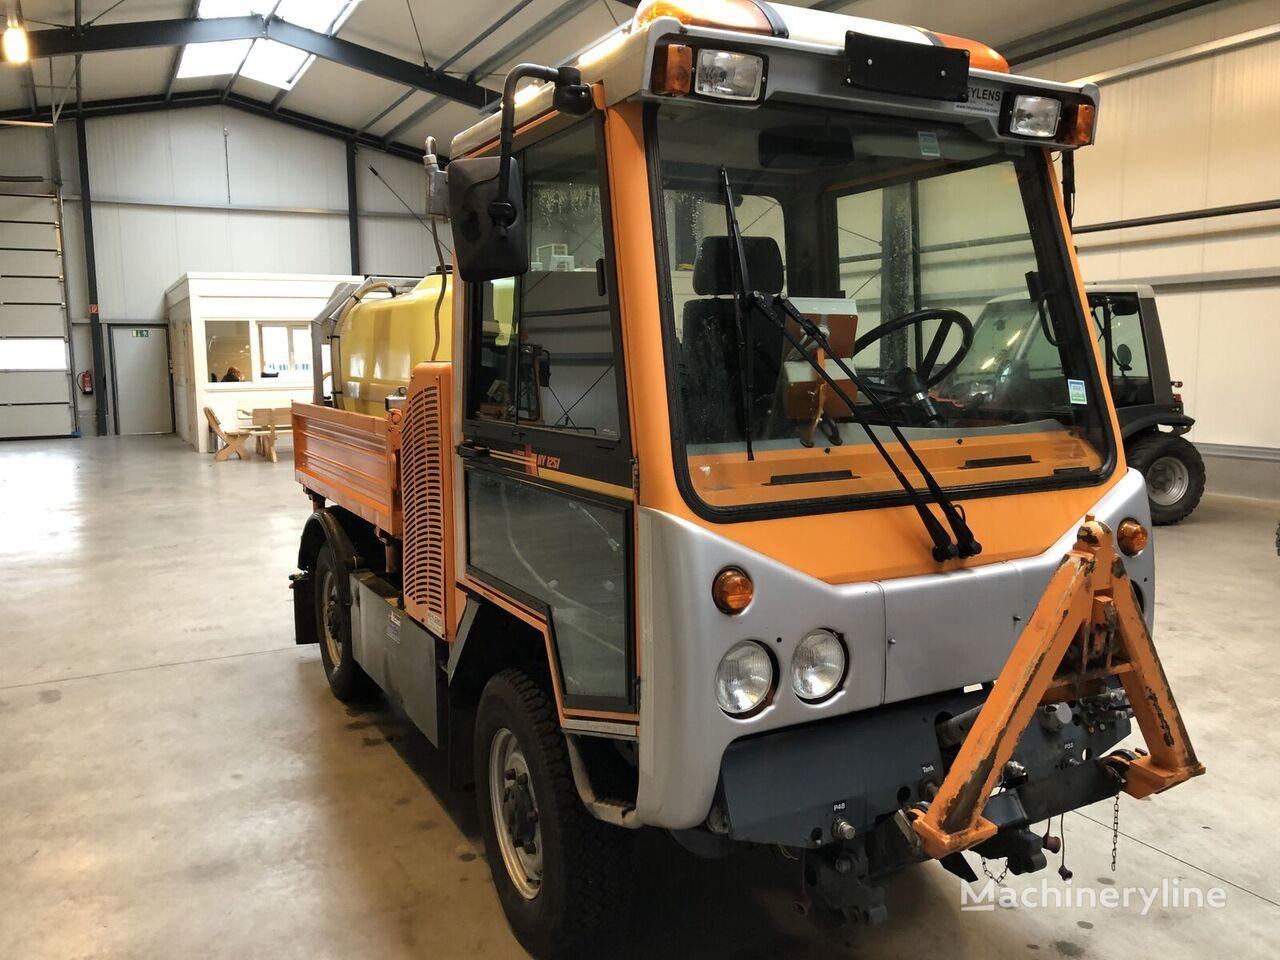 универсальная коммунальная машина Kiefer Boki HY 1251 1000 Liter solewasser winterdienst